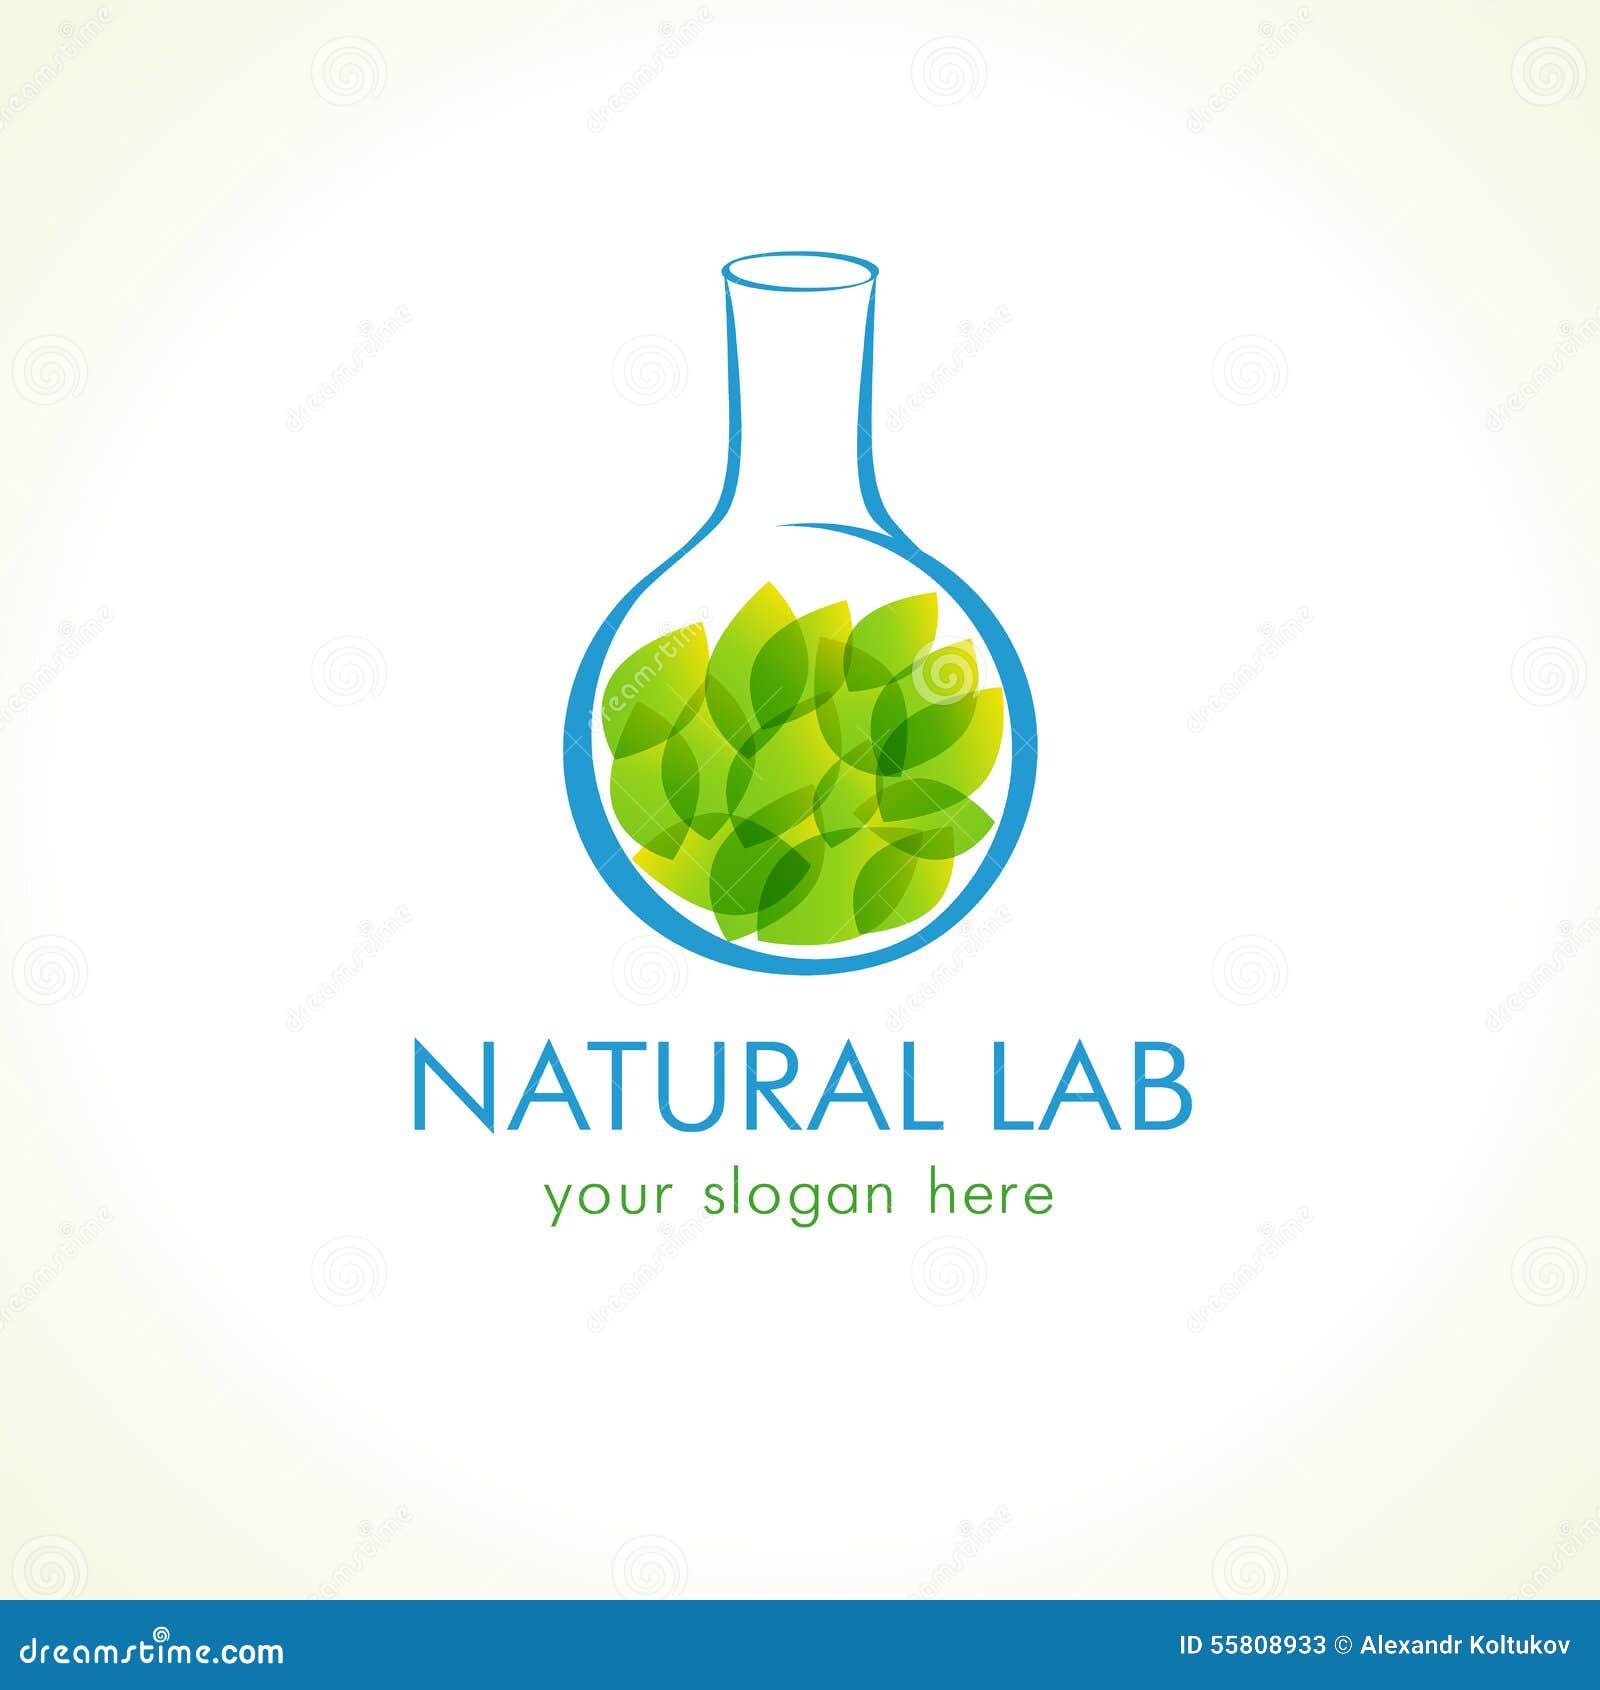 natural lab logo stock vector image 55808933